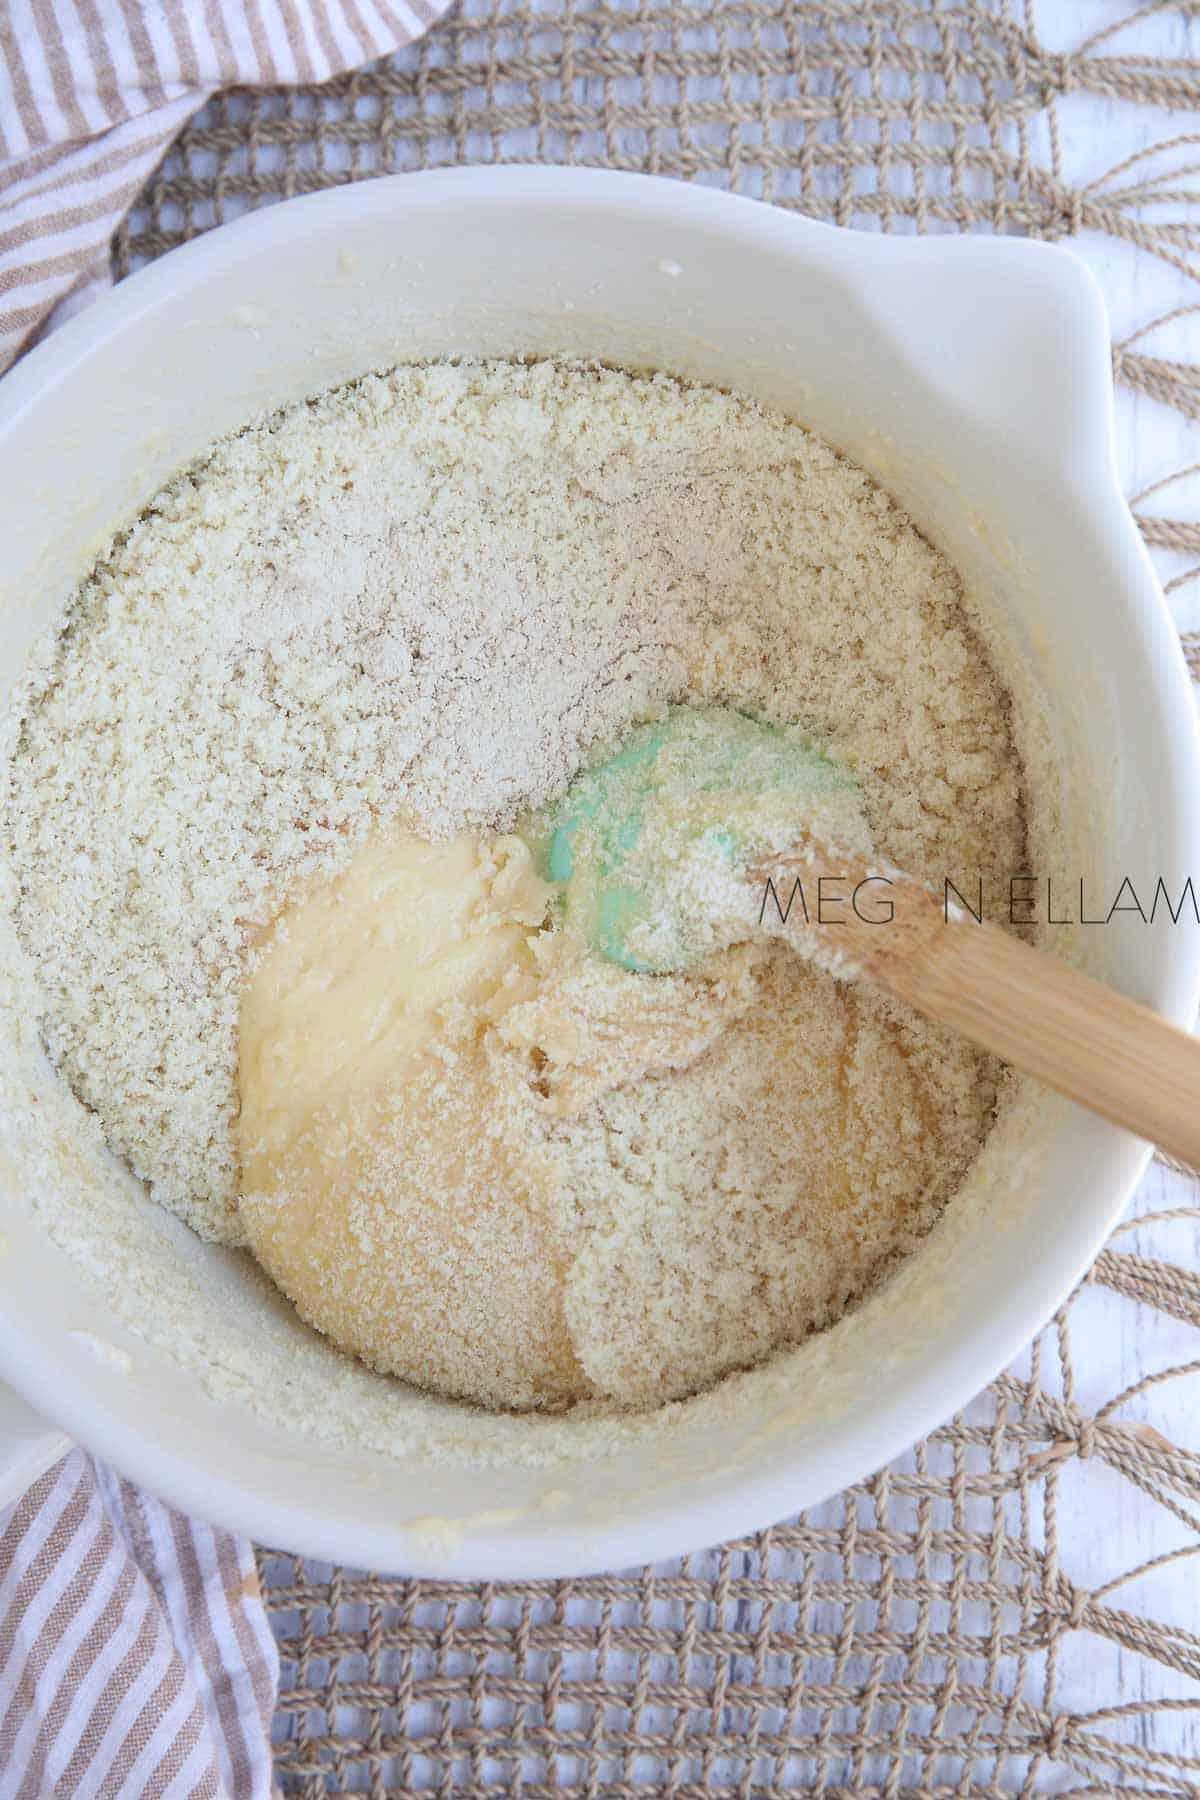 Mixing almond meal into fathead dough.